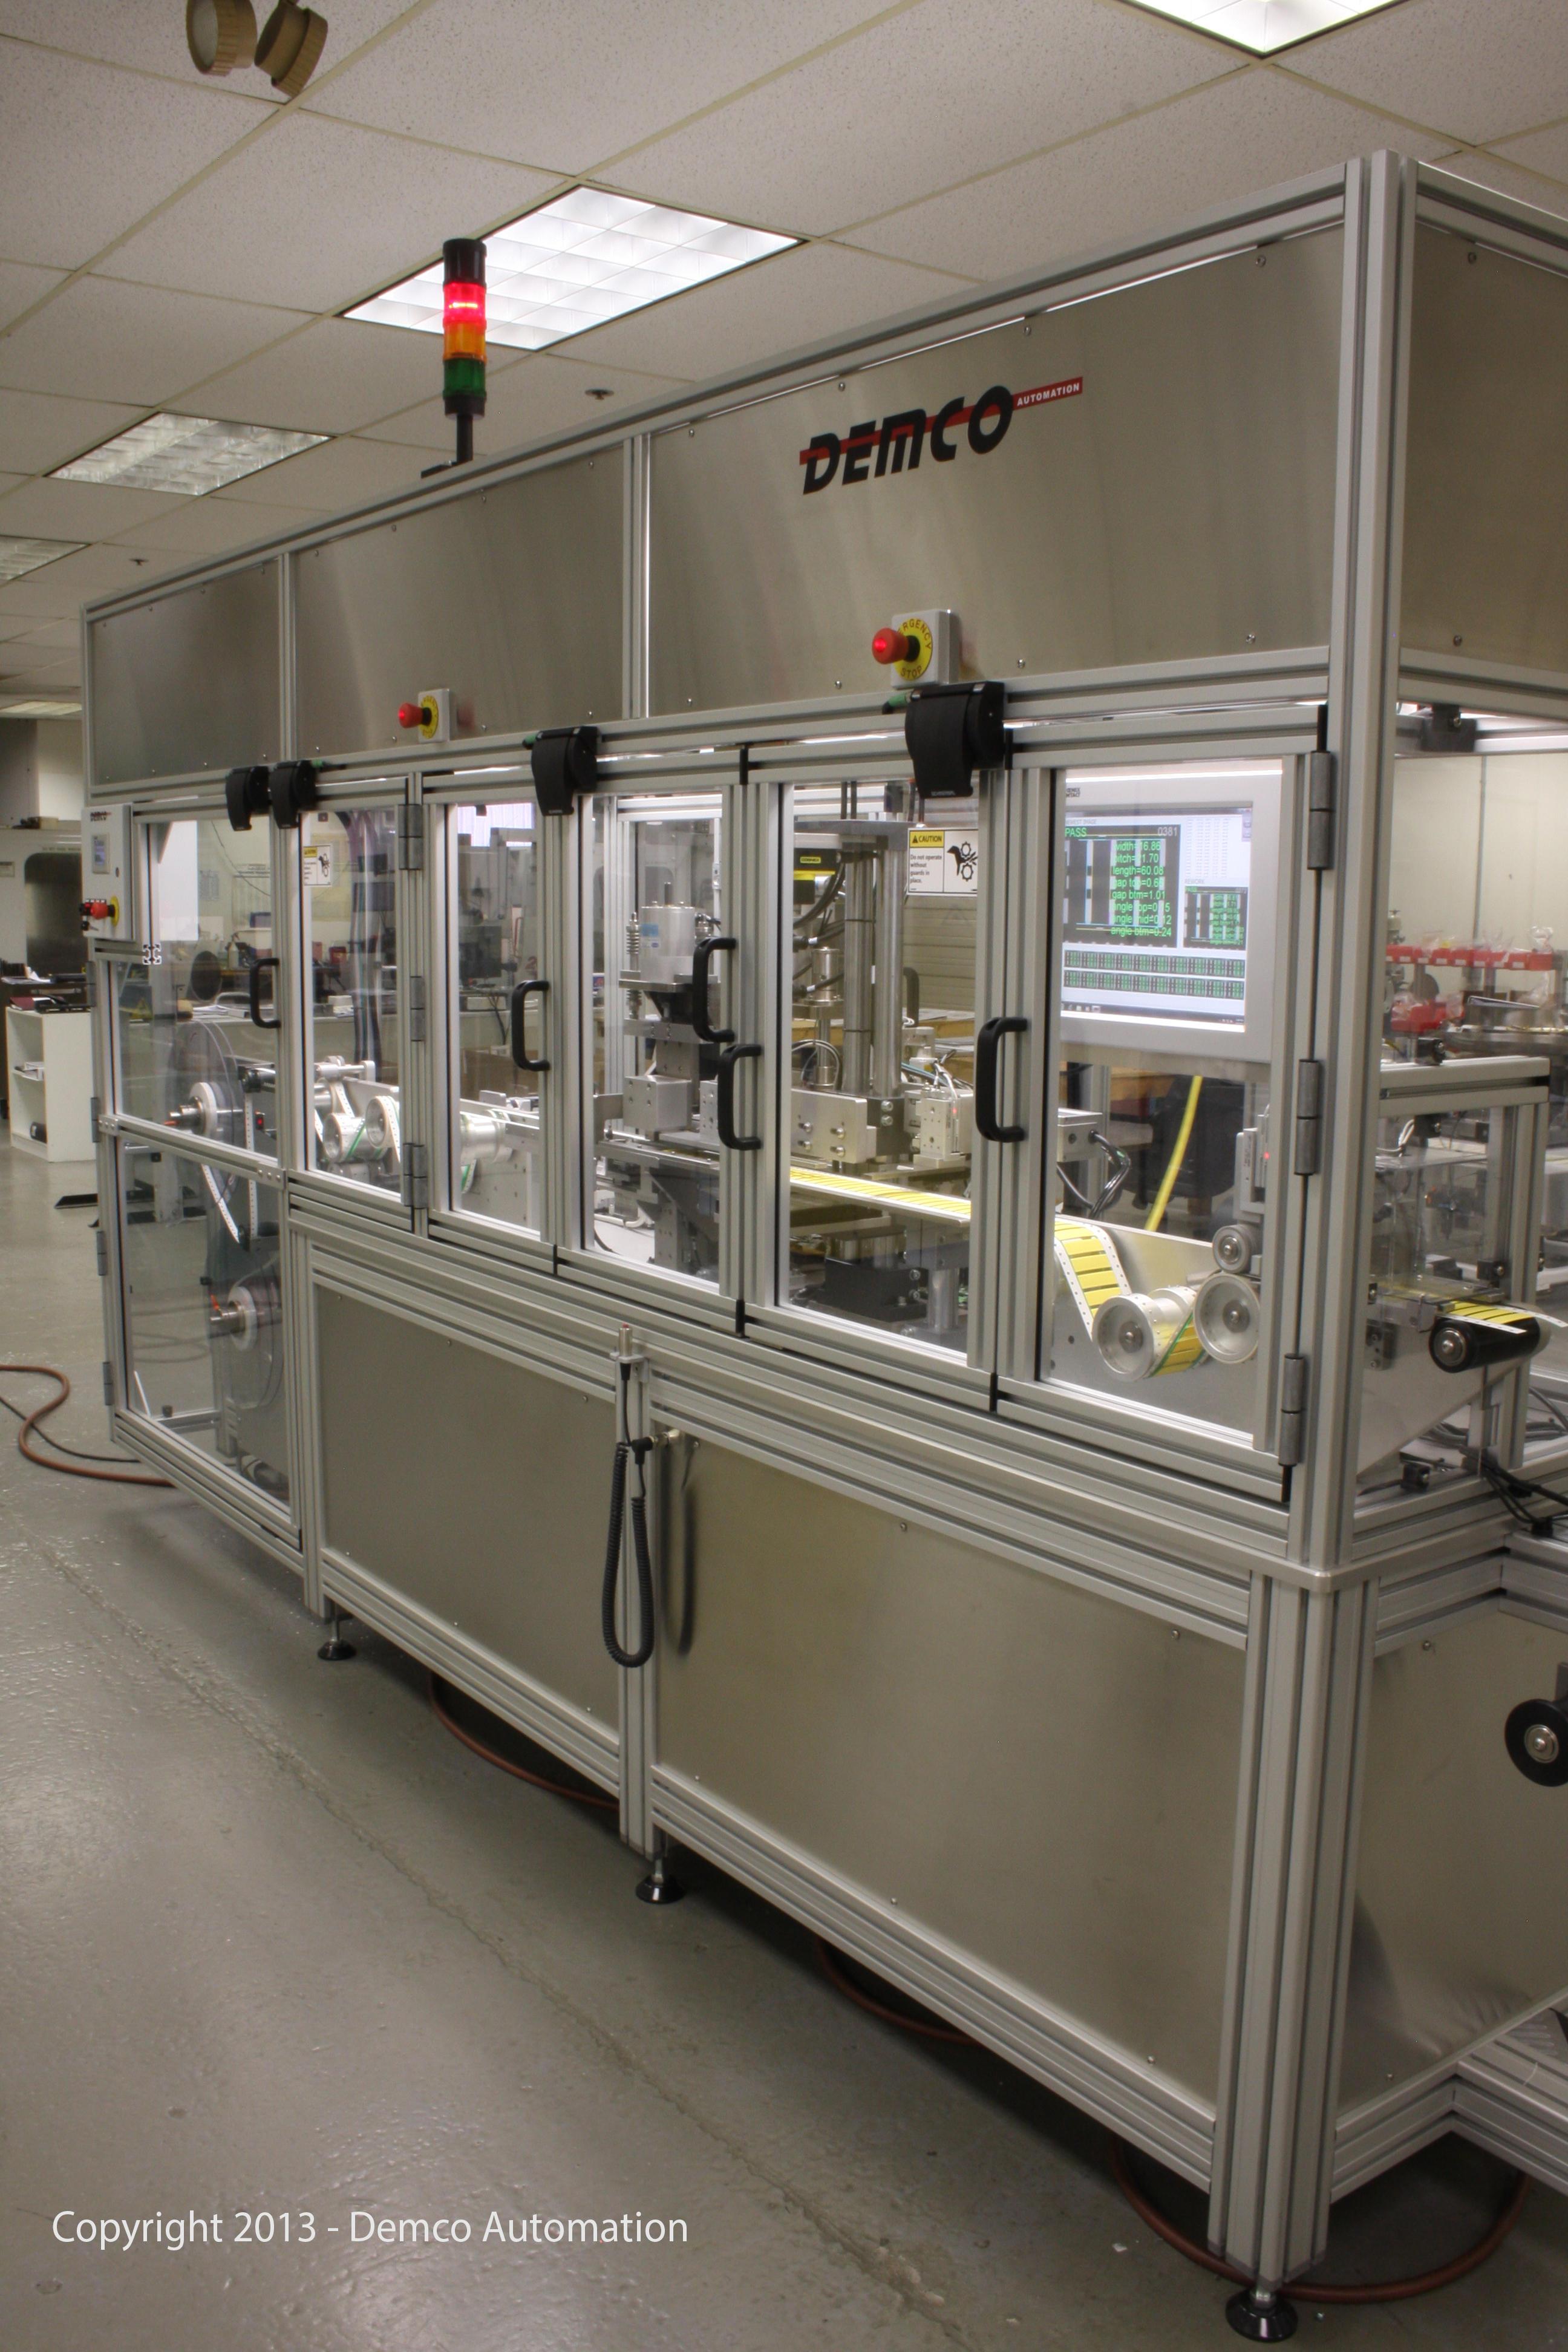 Demco Automation image 4